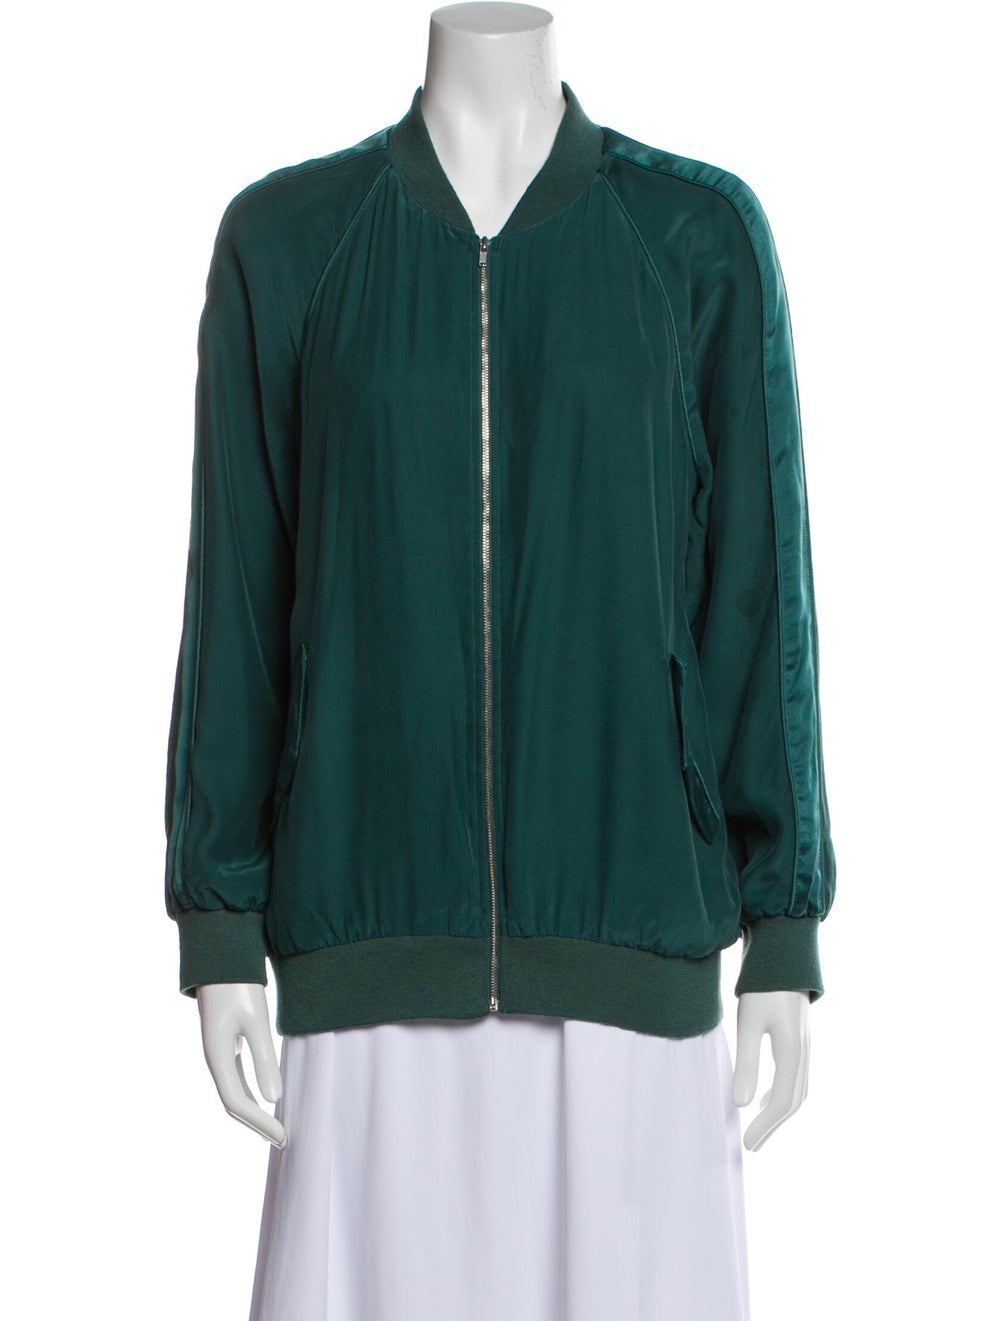 Equipment Silk Bomber Jacket Green - image 1